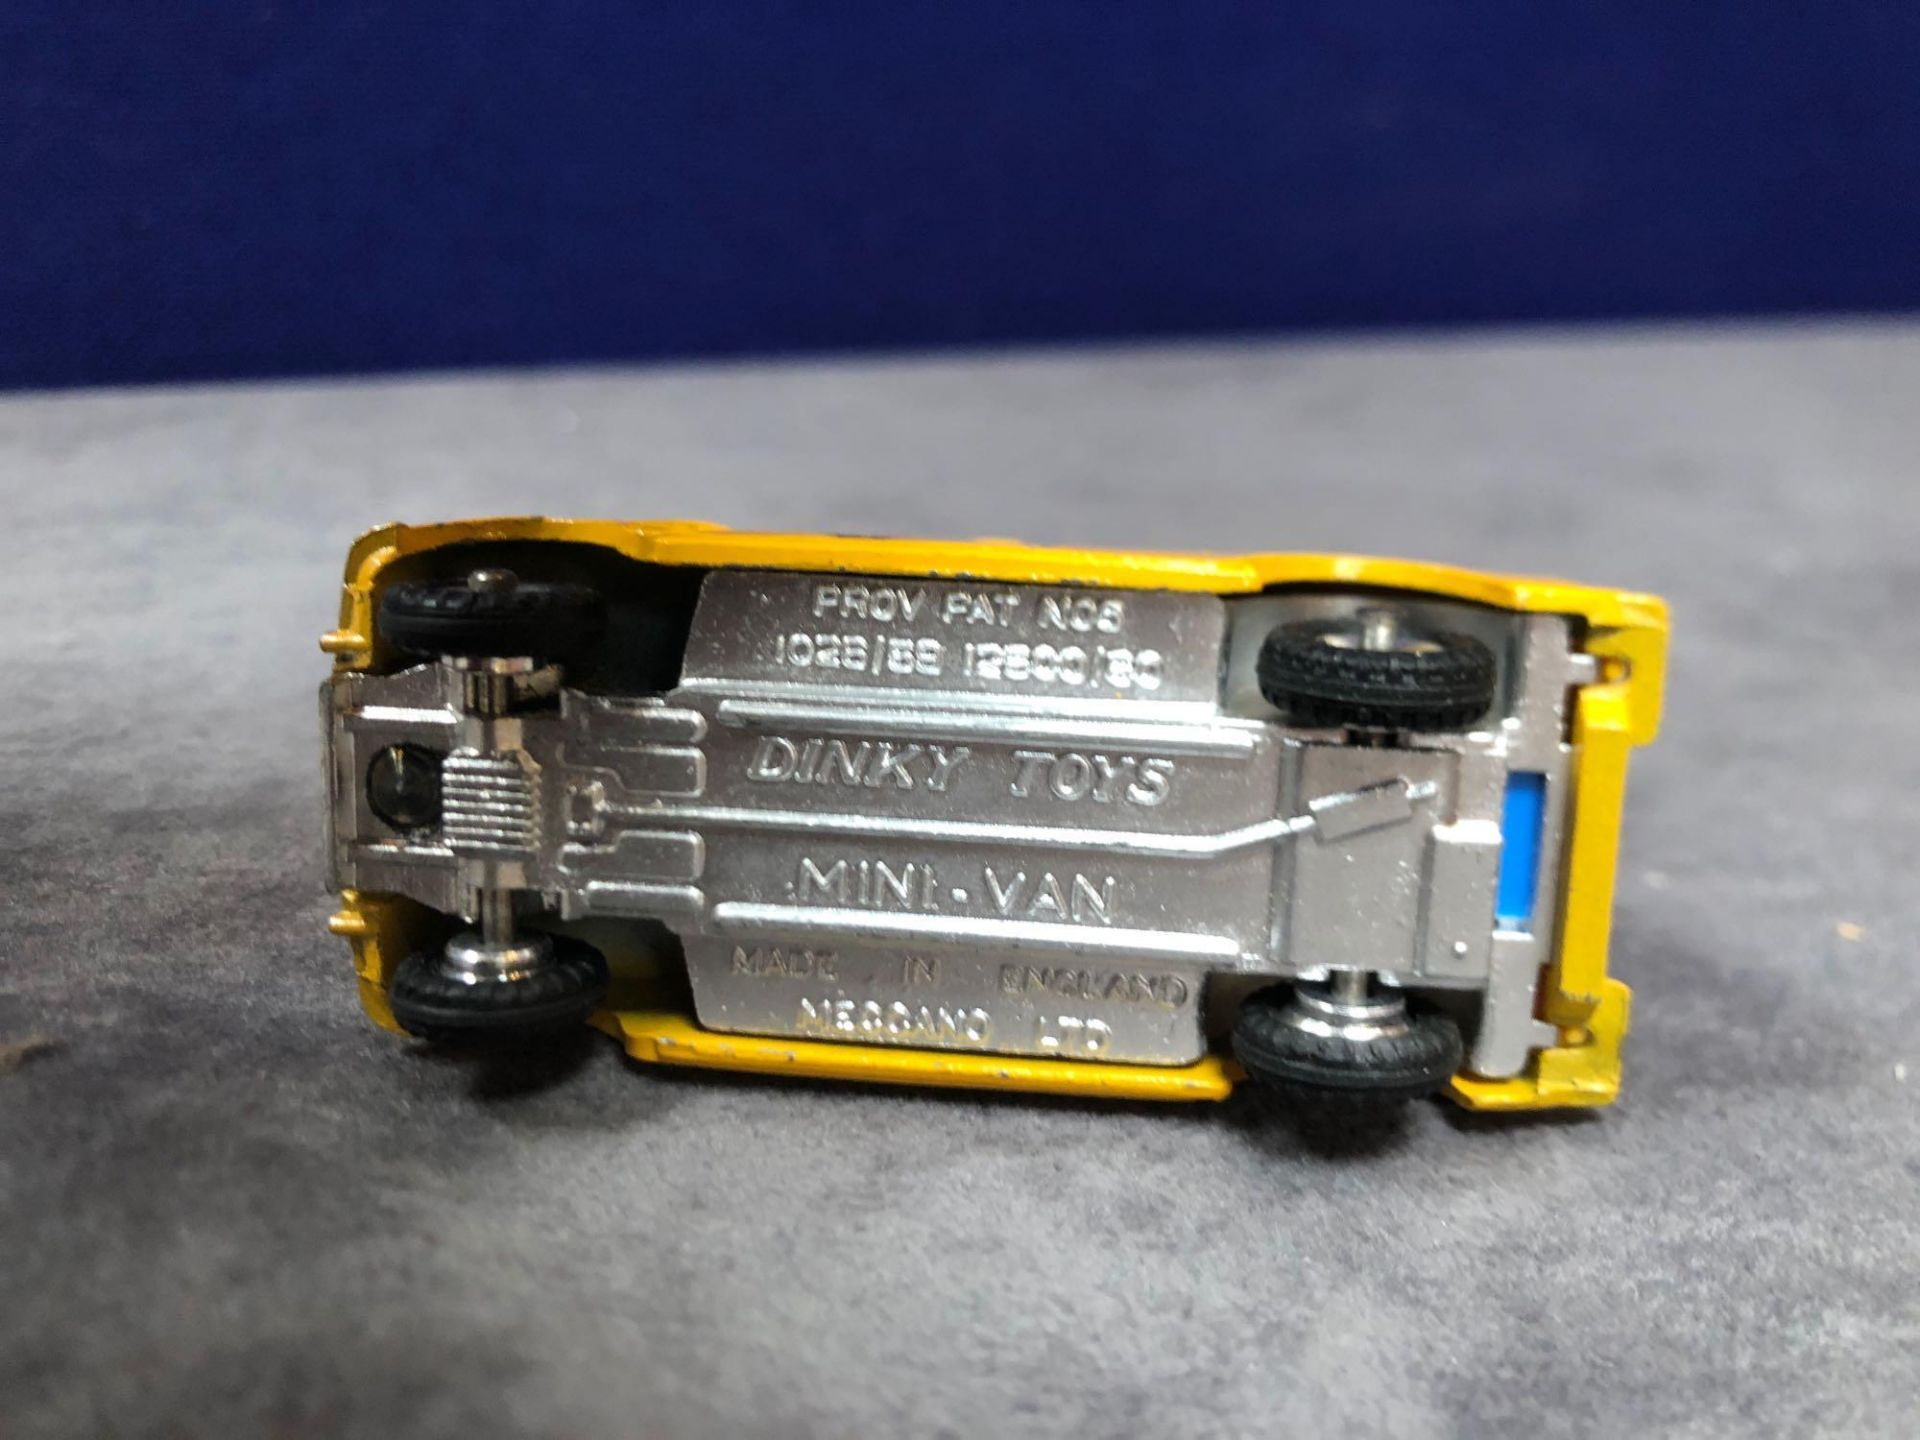 Dinky #274 AA Patrol Mini Van Yellow (AA Service) - Yellow Body And White Roof. AA Service To Van - Image 4 of 4